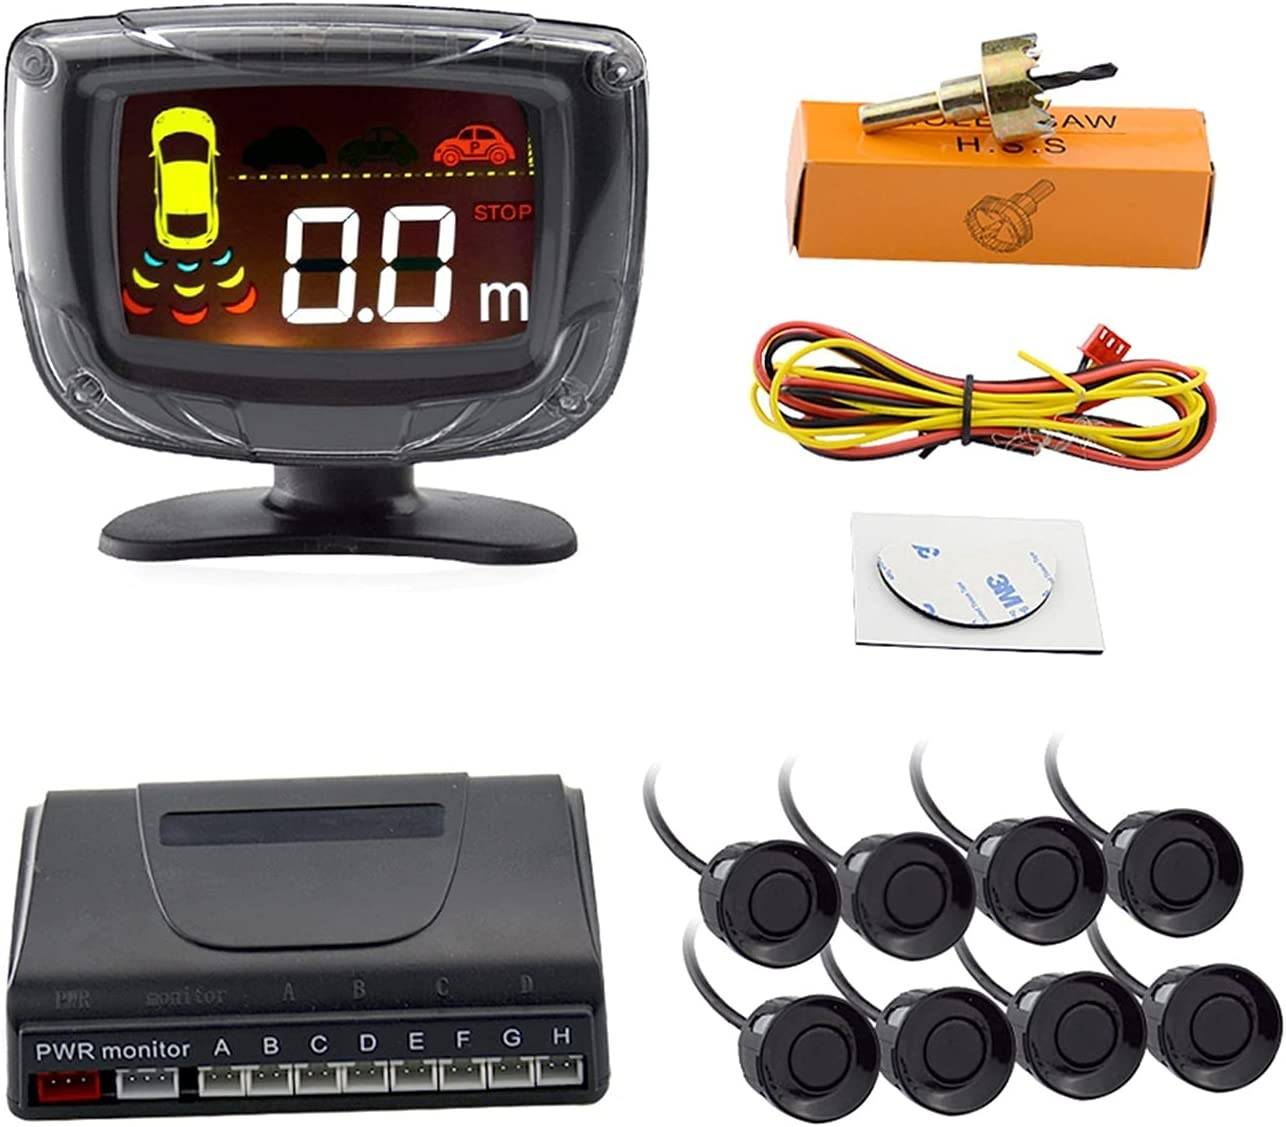 Car Parking Detroit Mall Sensor 4 8 Radar Monito Ranking TOP1 Backup Reverse Detector Rear